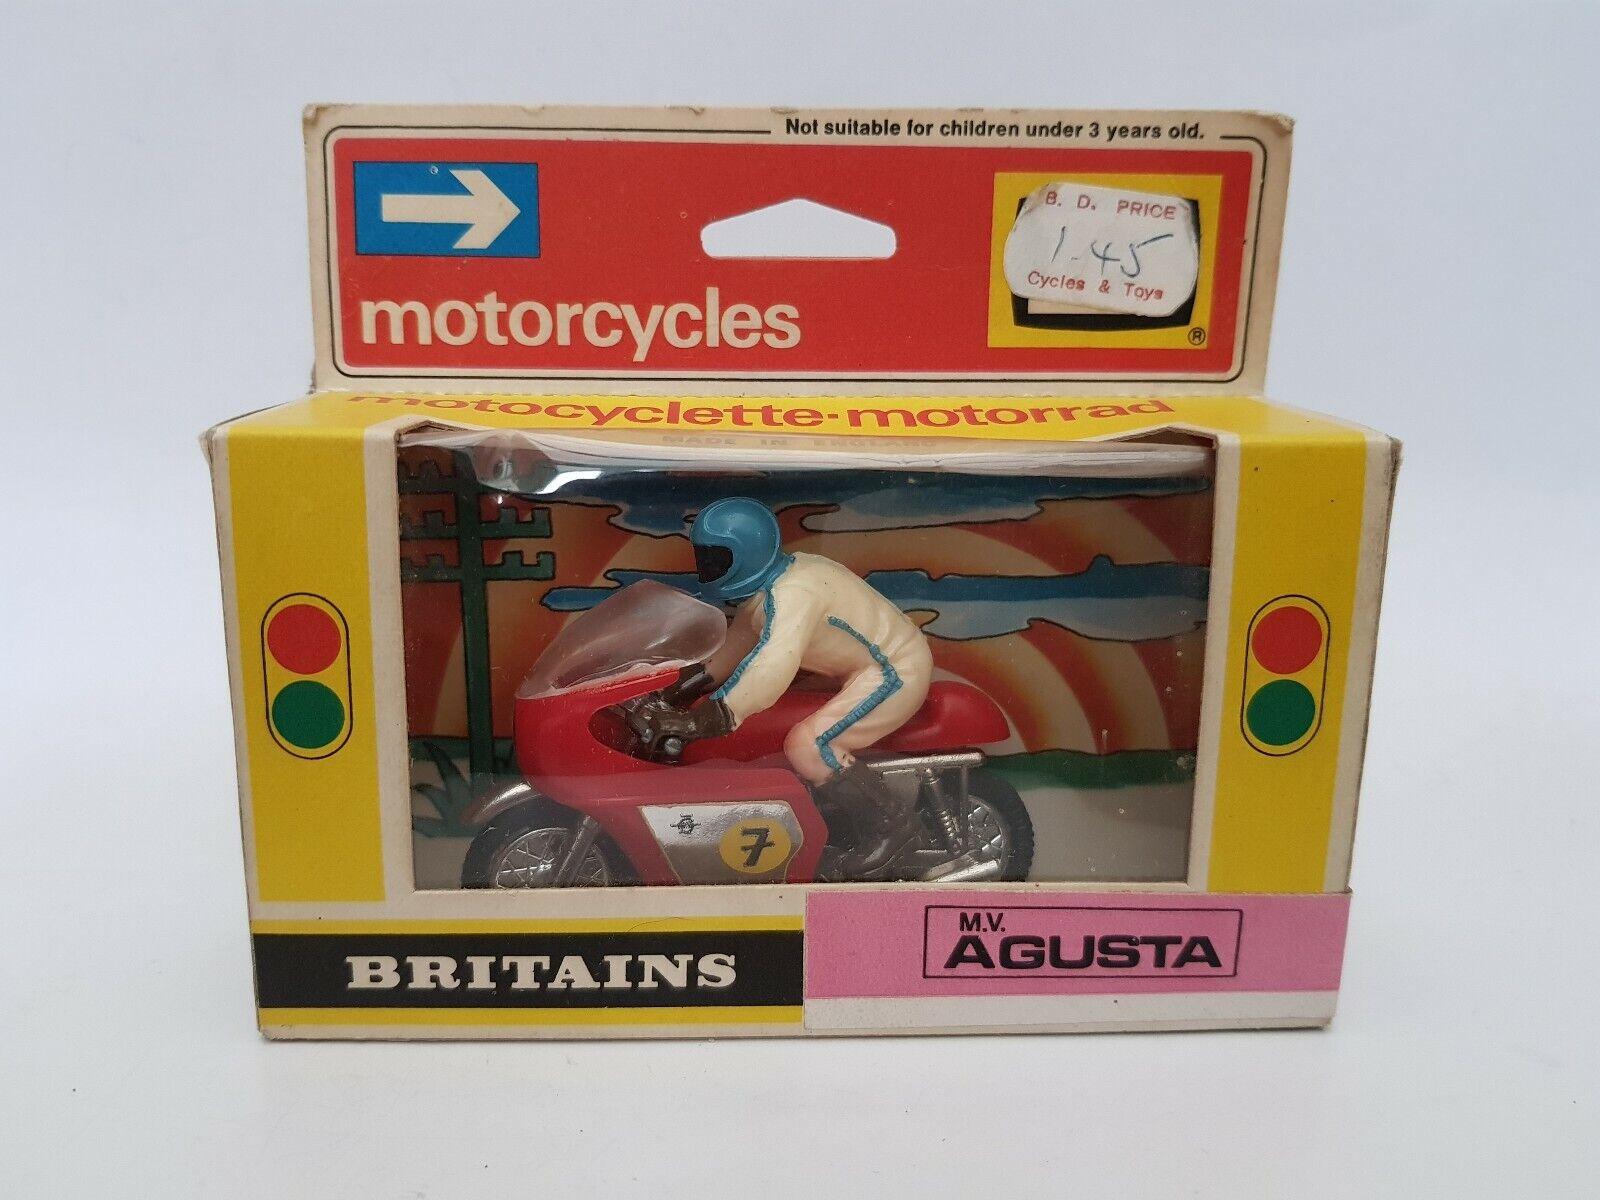 Britains 9678 MV Agusta Mint & Boxed 1 32 scale